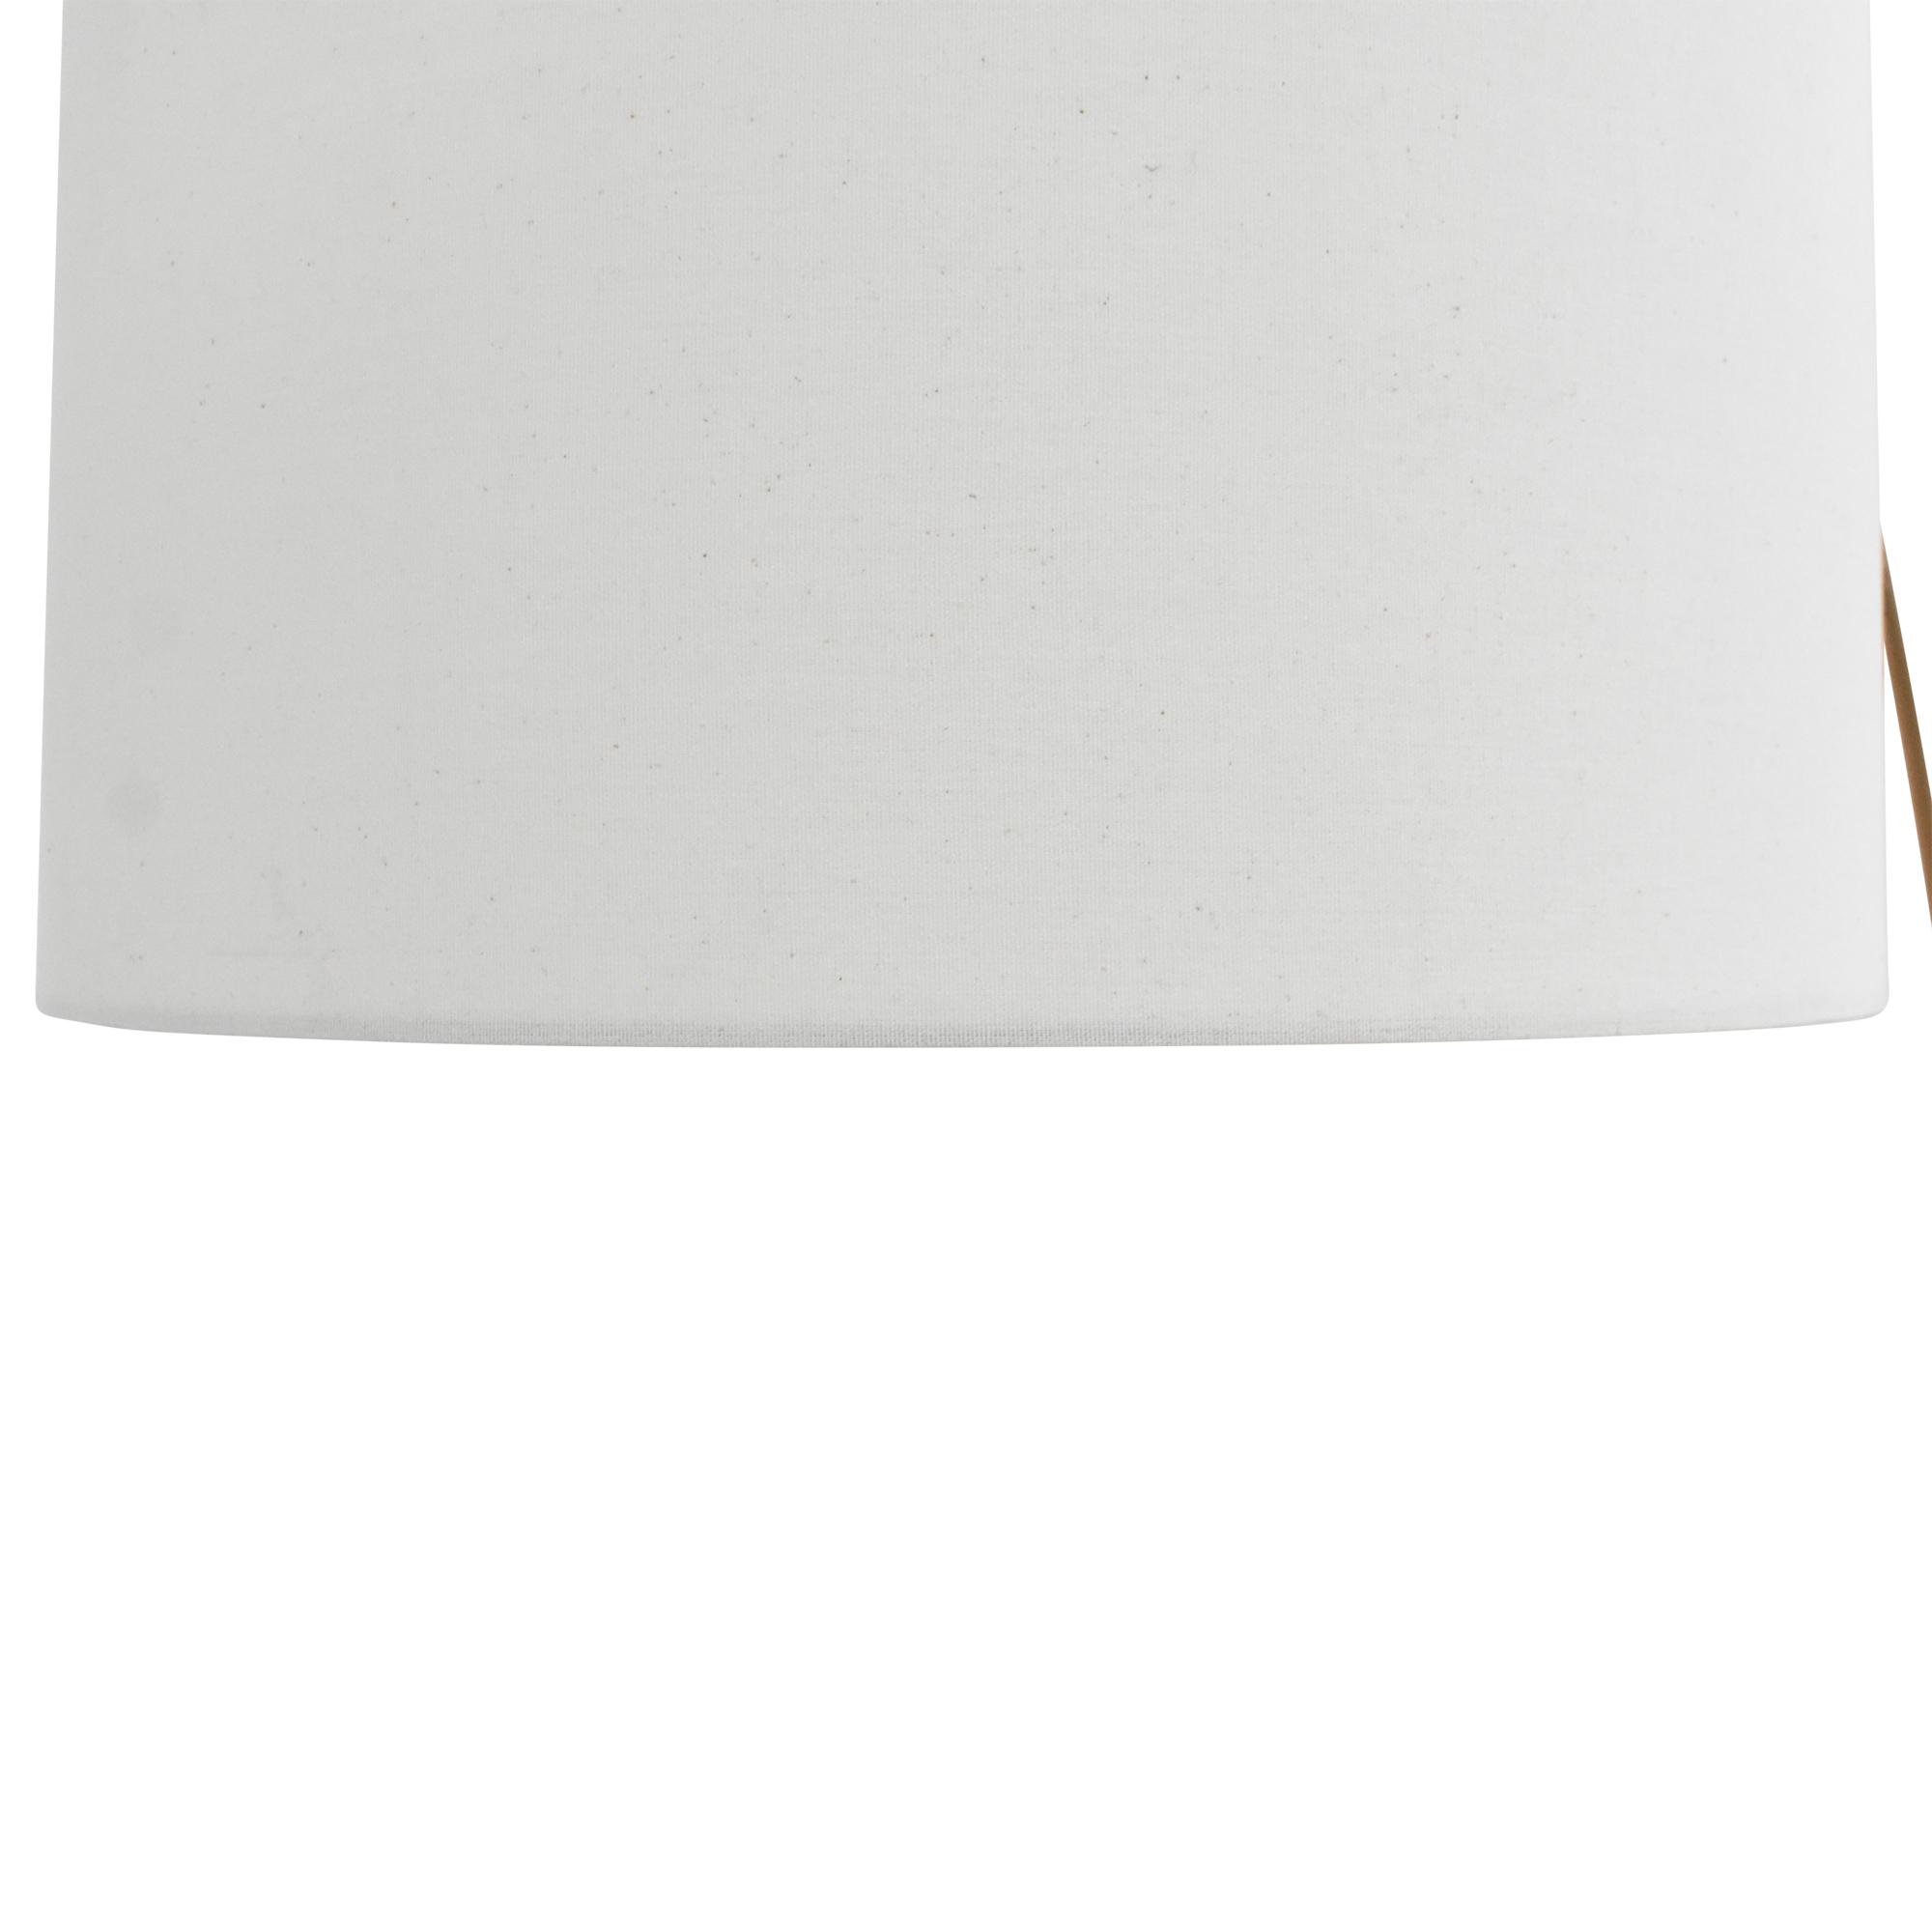 CB2 CB2 Big Dipper Arc Floor Lamp for sale